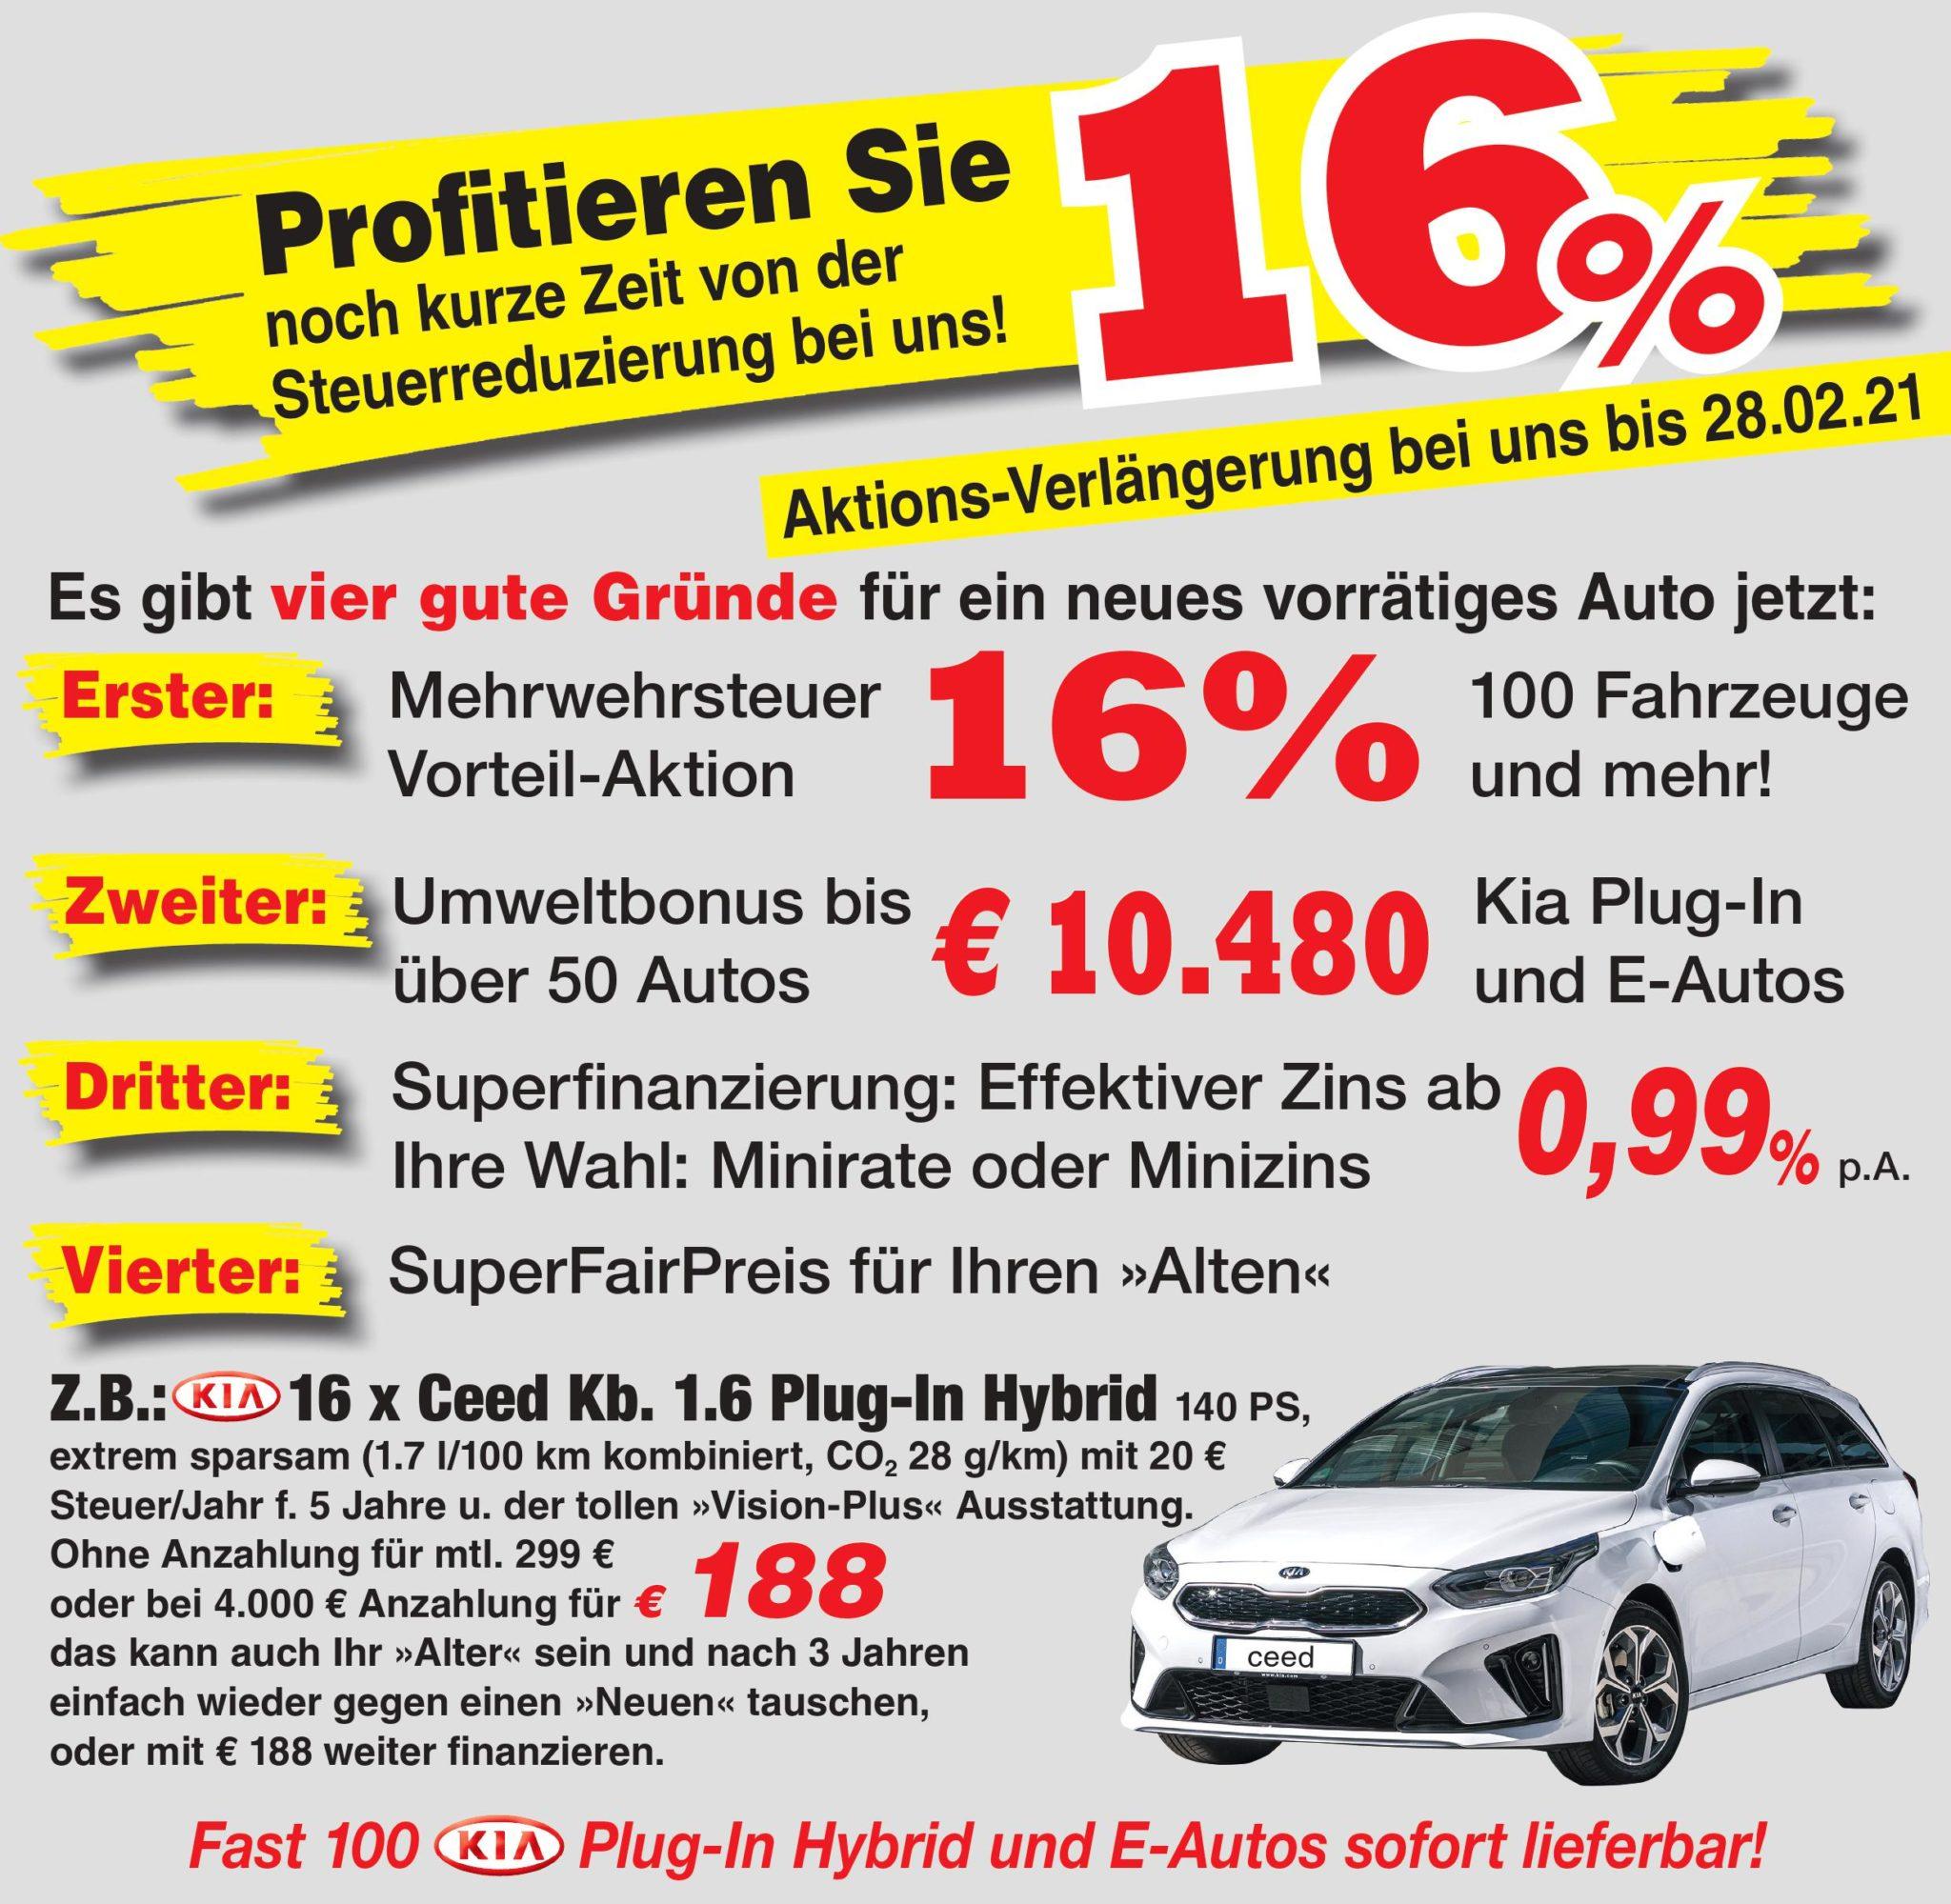 Auto Deckers Profitieren